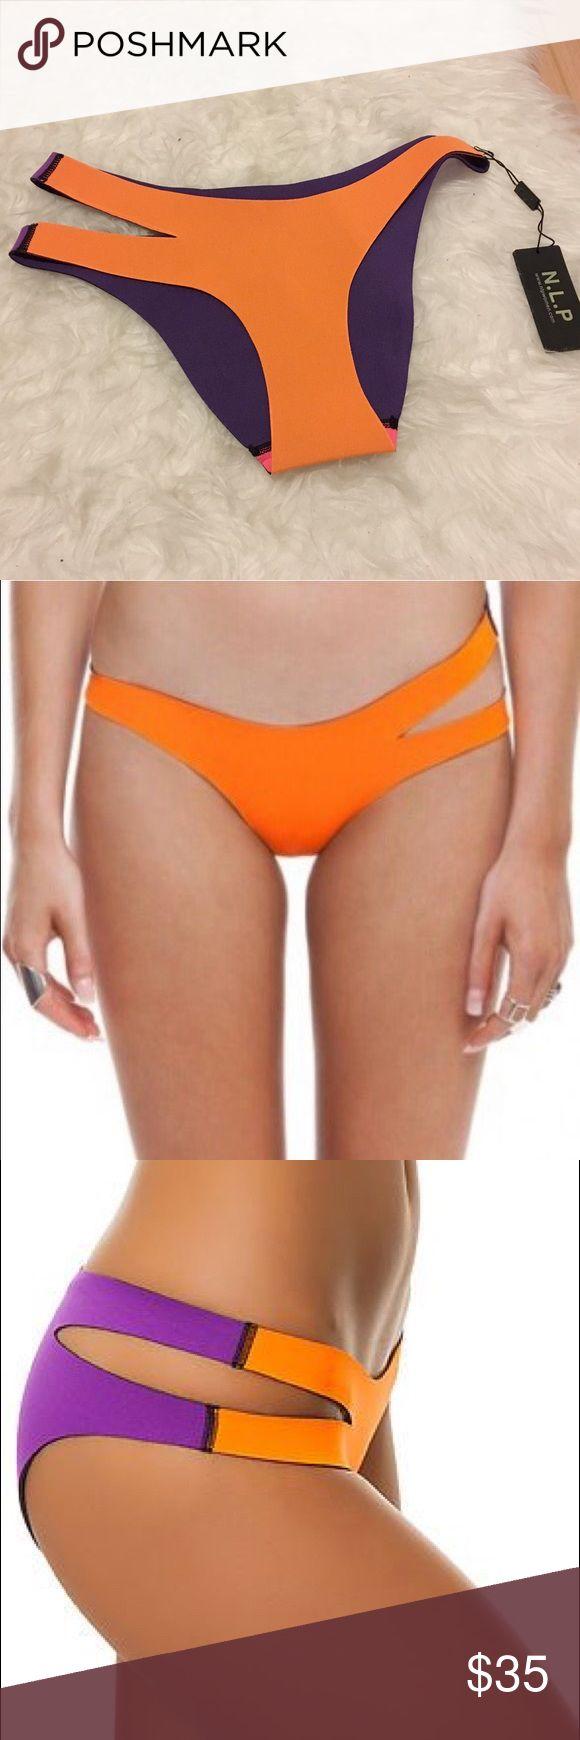 N.L.P cut out swim bottom Brand new with tag. Size SMALL. Back of the bikini is purple. ❌NO TRADES❌ NLP Swim Bikinis